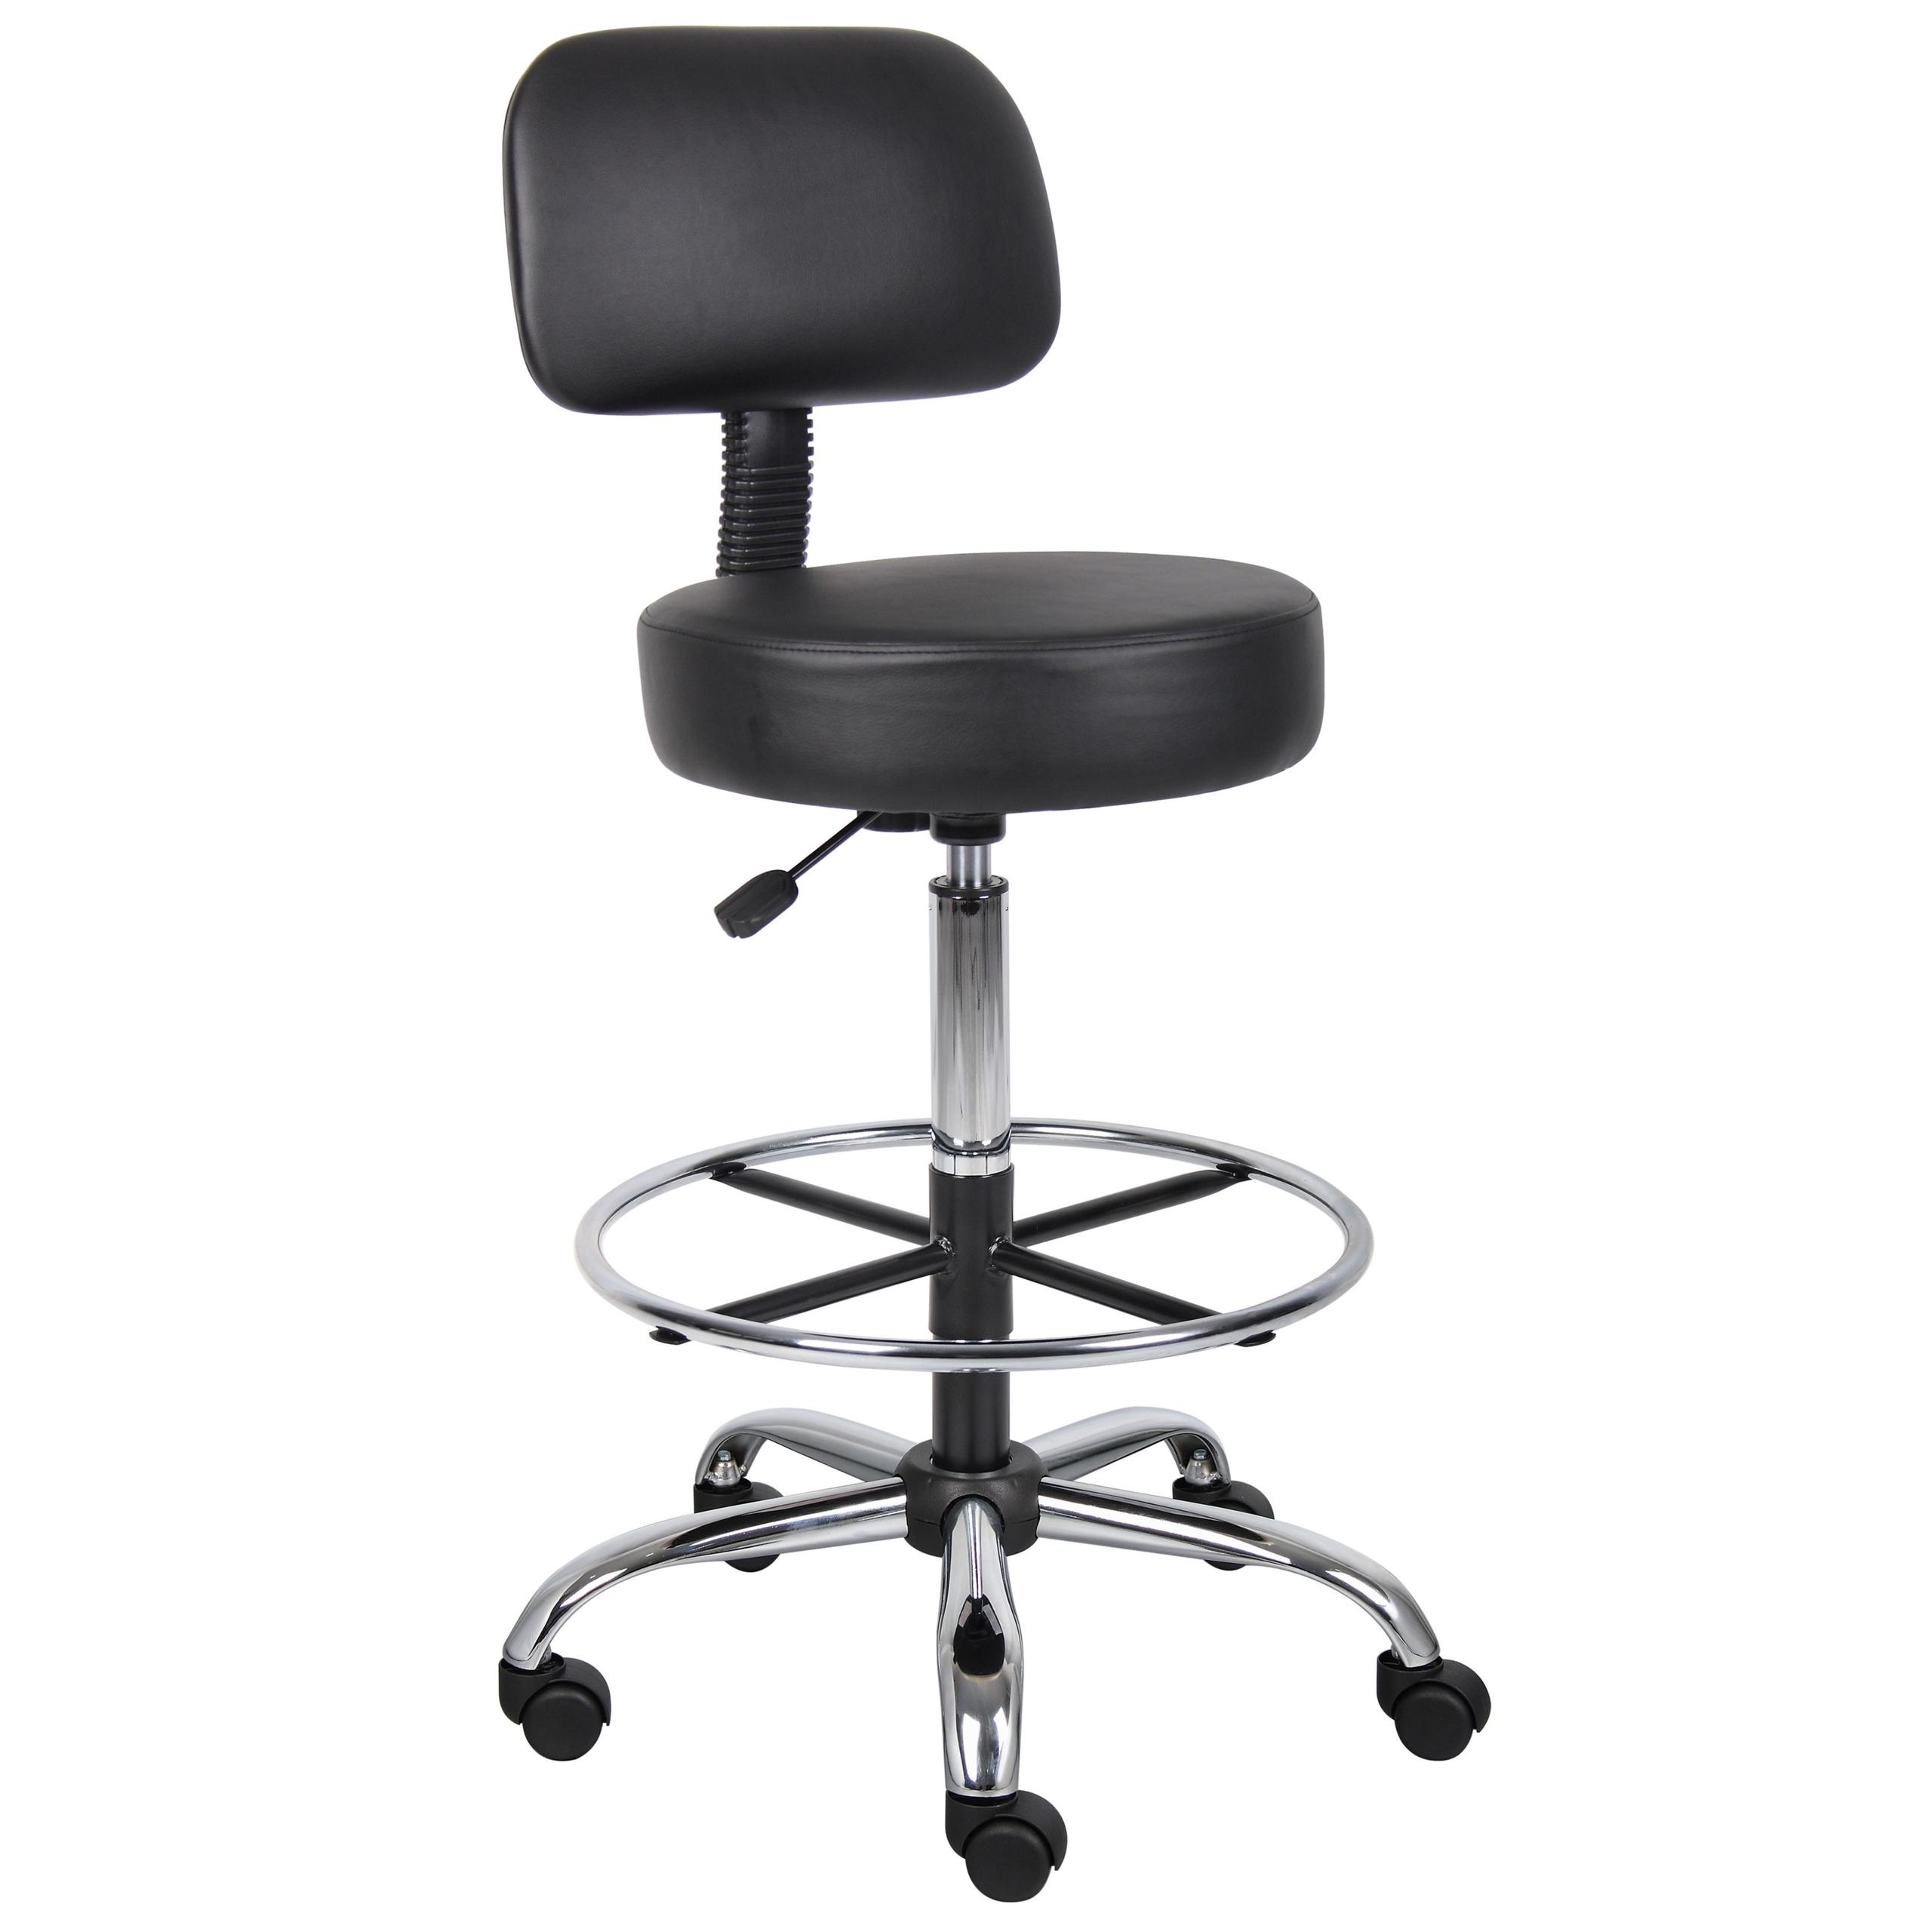 Wonderful Boss B16245 BK Caressoft Medical/Drafting Stool With Back Cushion